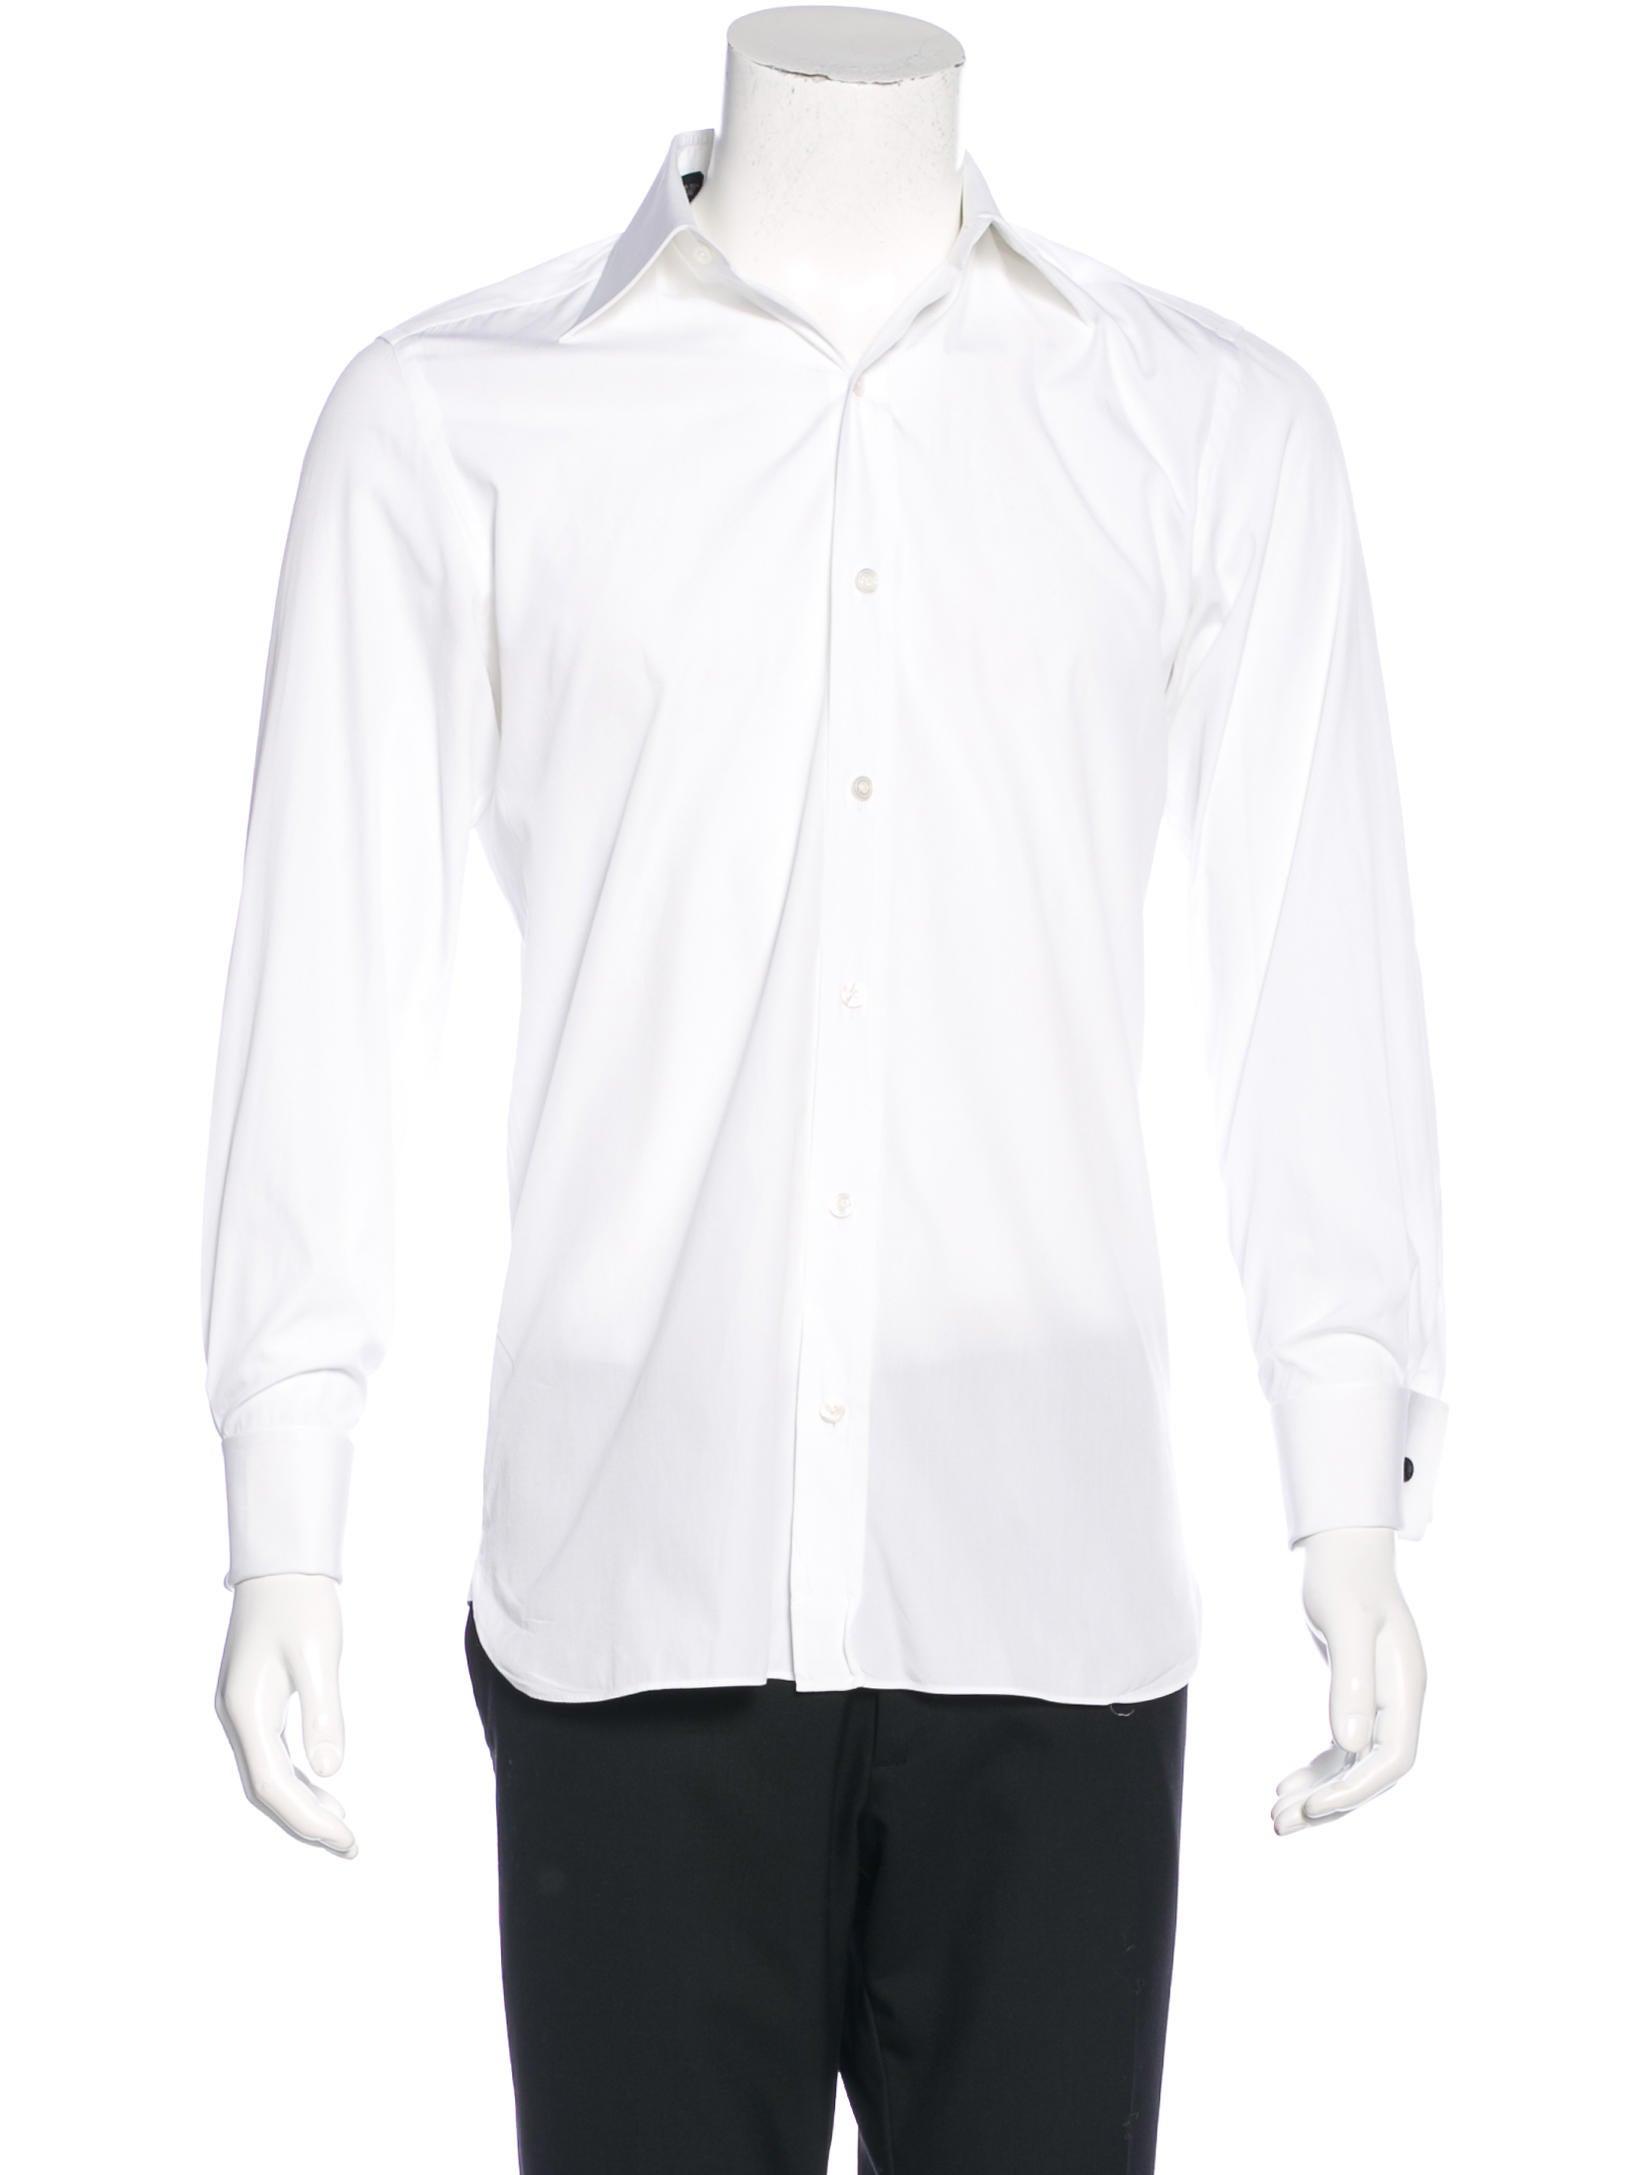 Tom ford french cuff dress shirt clothing tom33538 for Dress shirt french cuffs